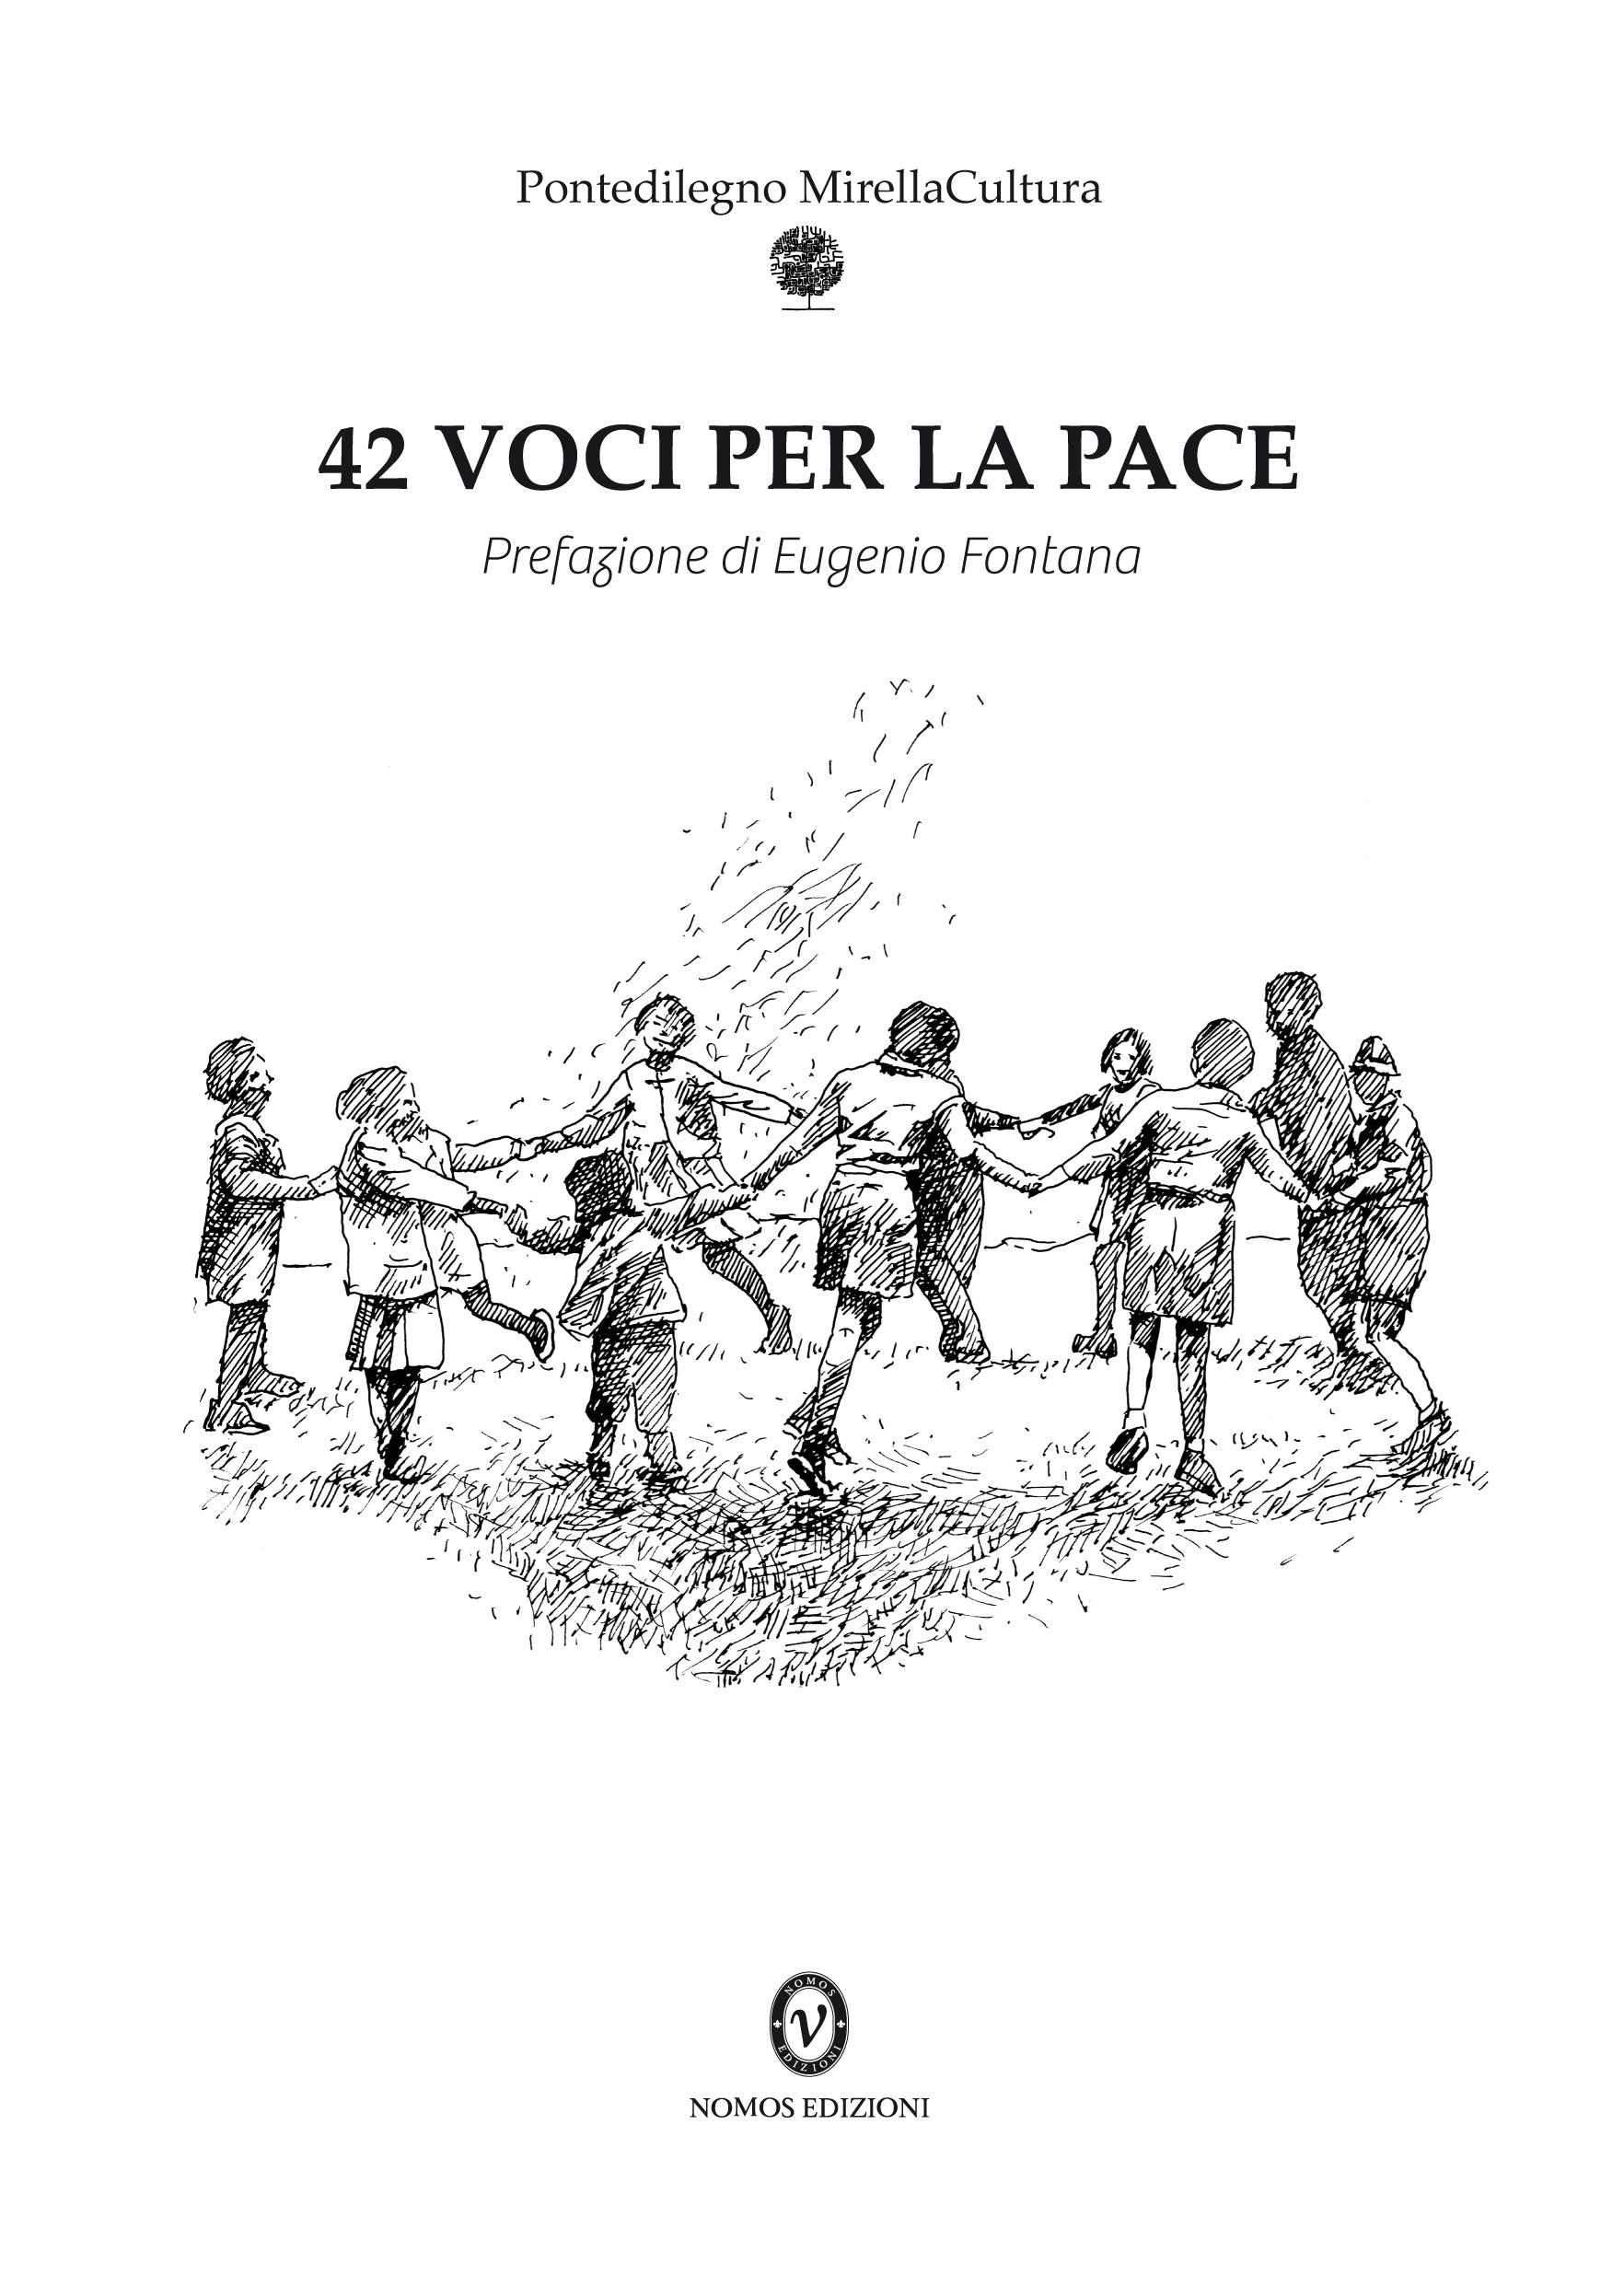 42 voci per la pace – MirellaCultura